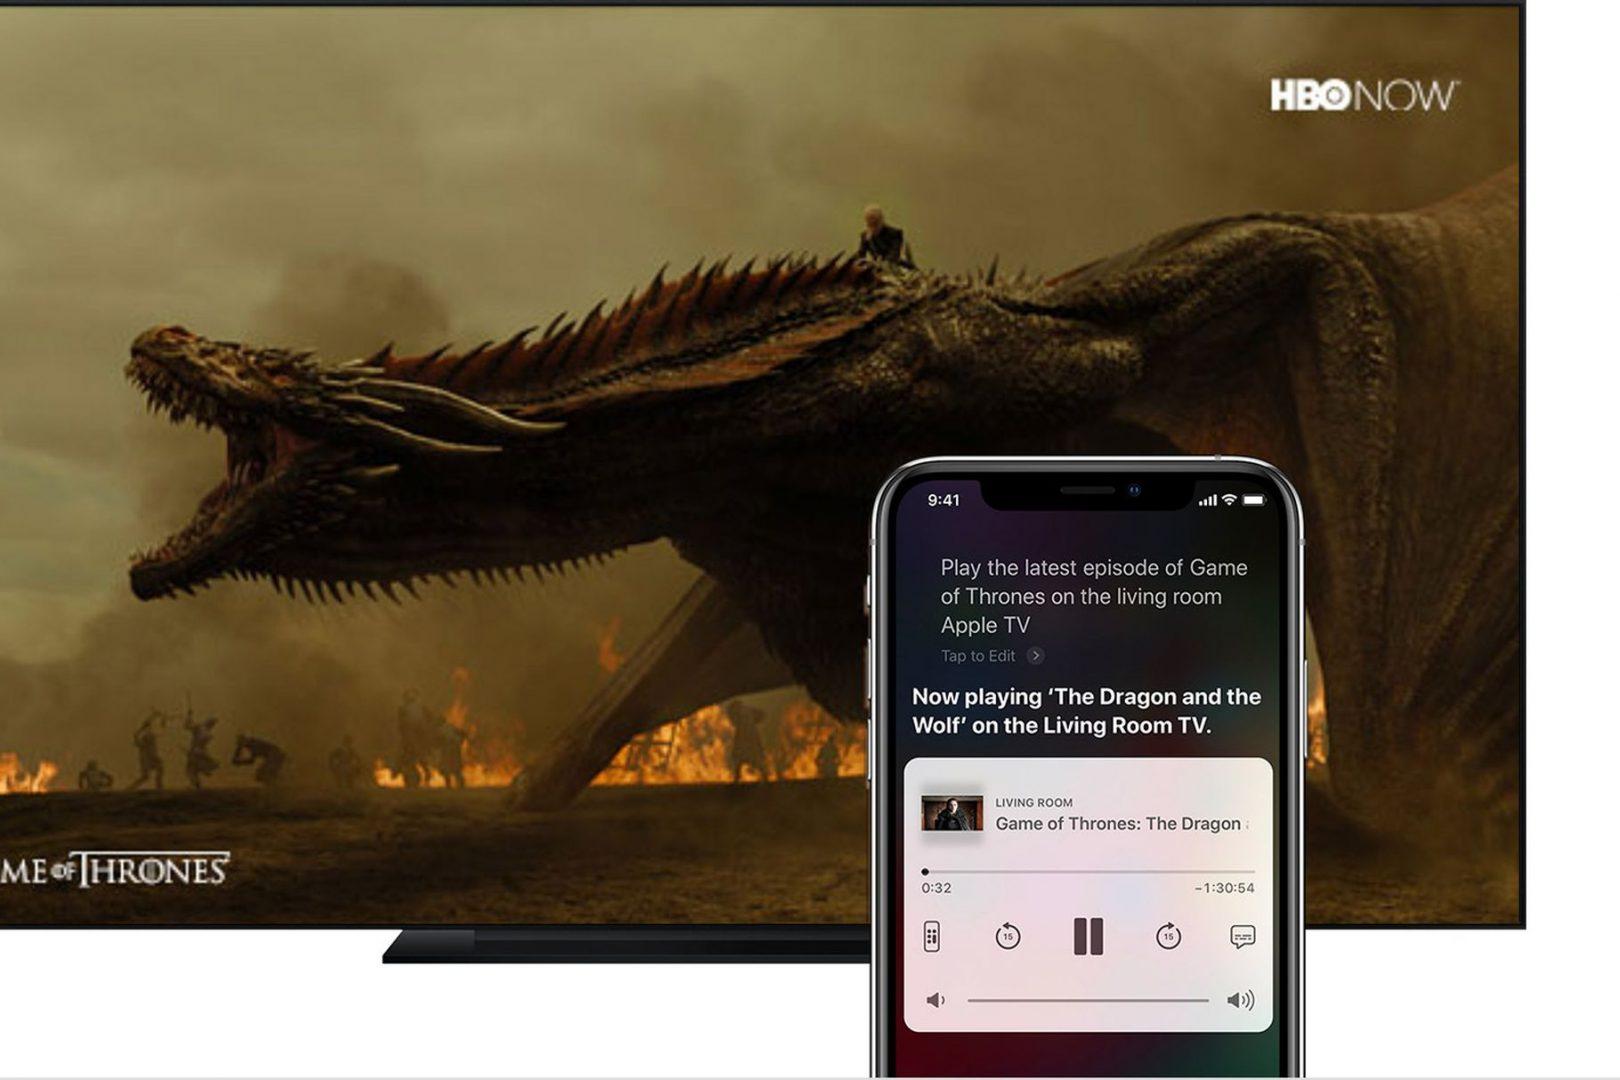 Apple iOS 12.2 Ask Siri to play video on Apple TV